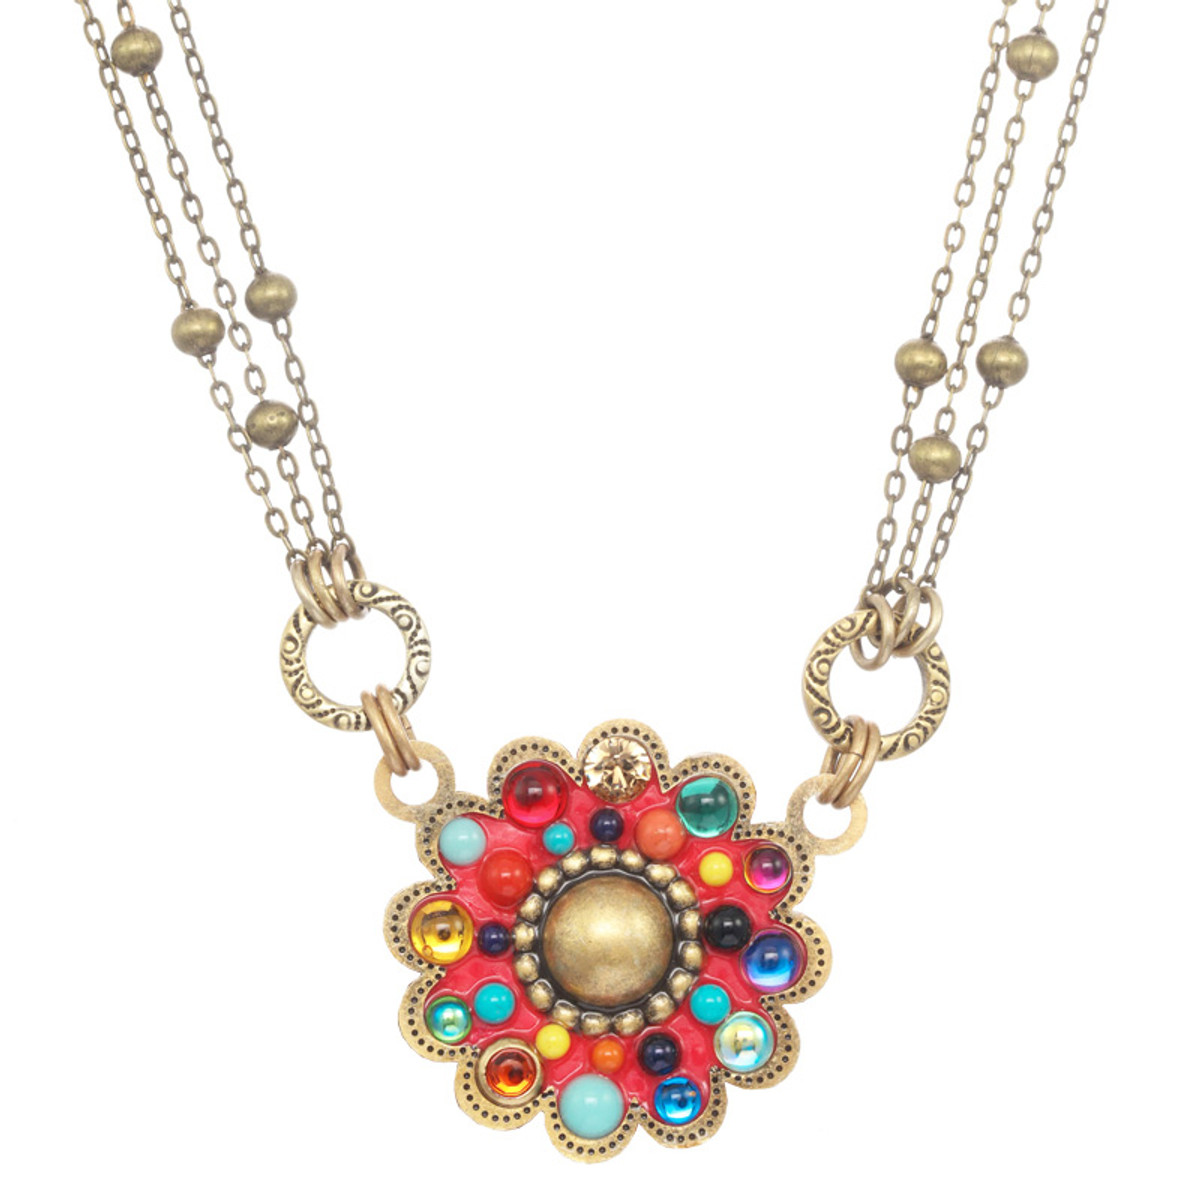 Michal Golan Neon Pink Flower Necklace